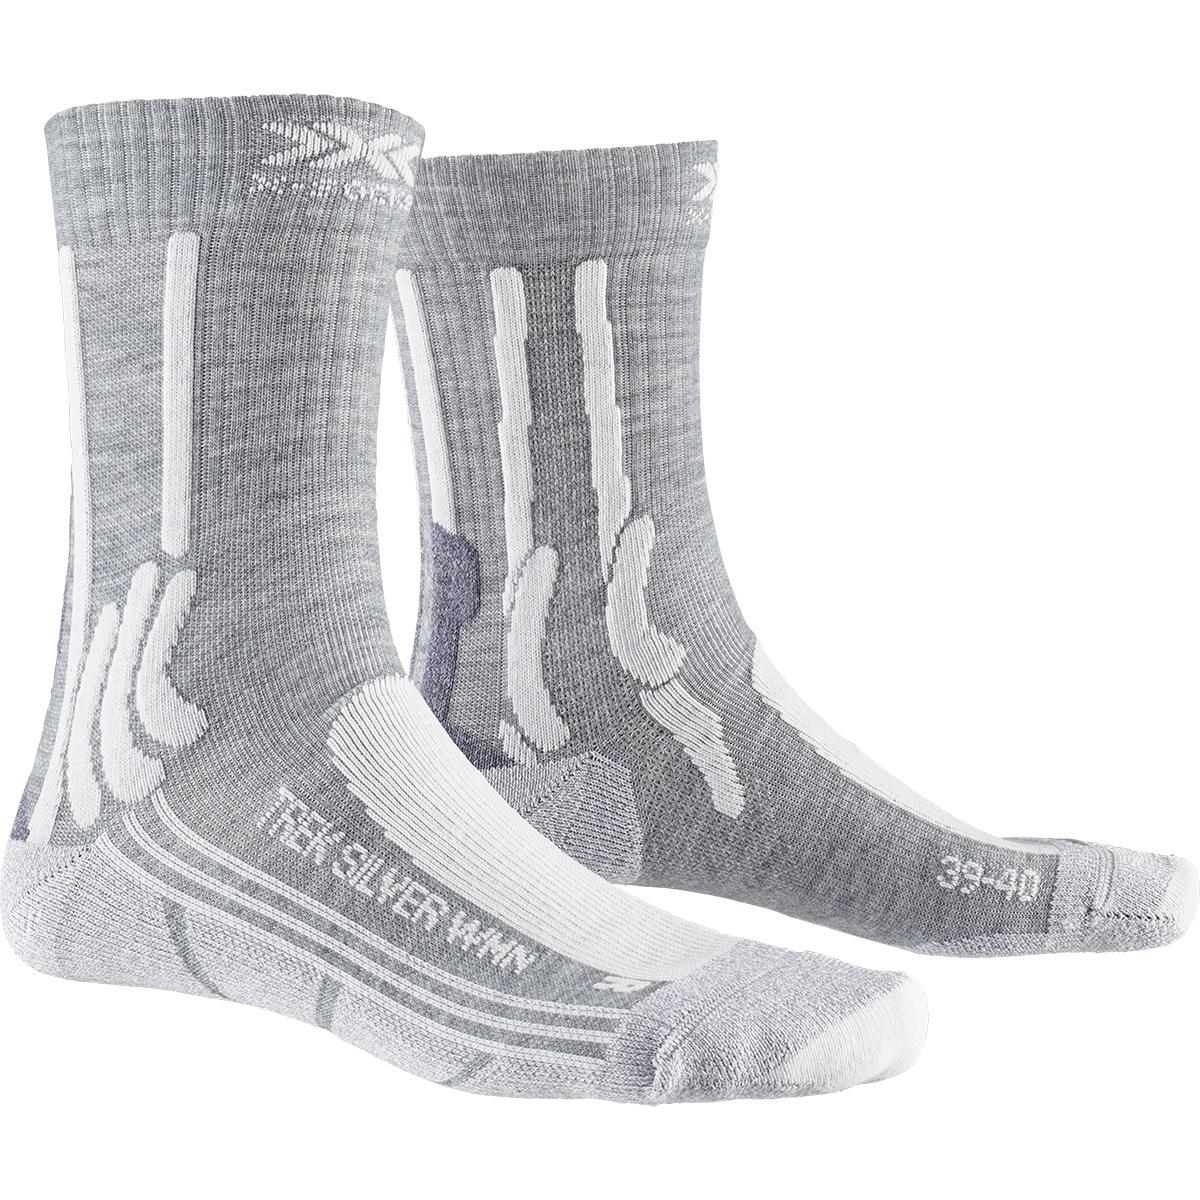 Bild von X-Socks Trek Silver Damensocken - dolomite grey melange/pearl grey